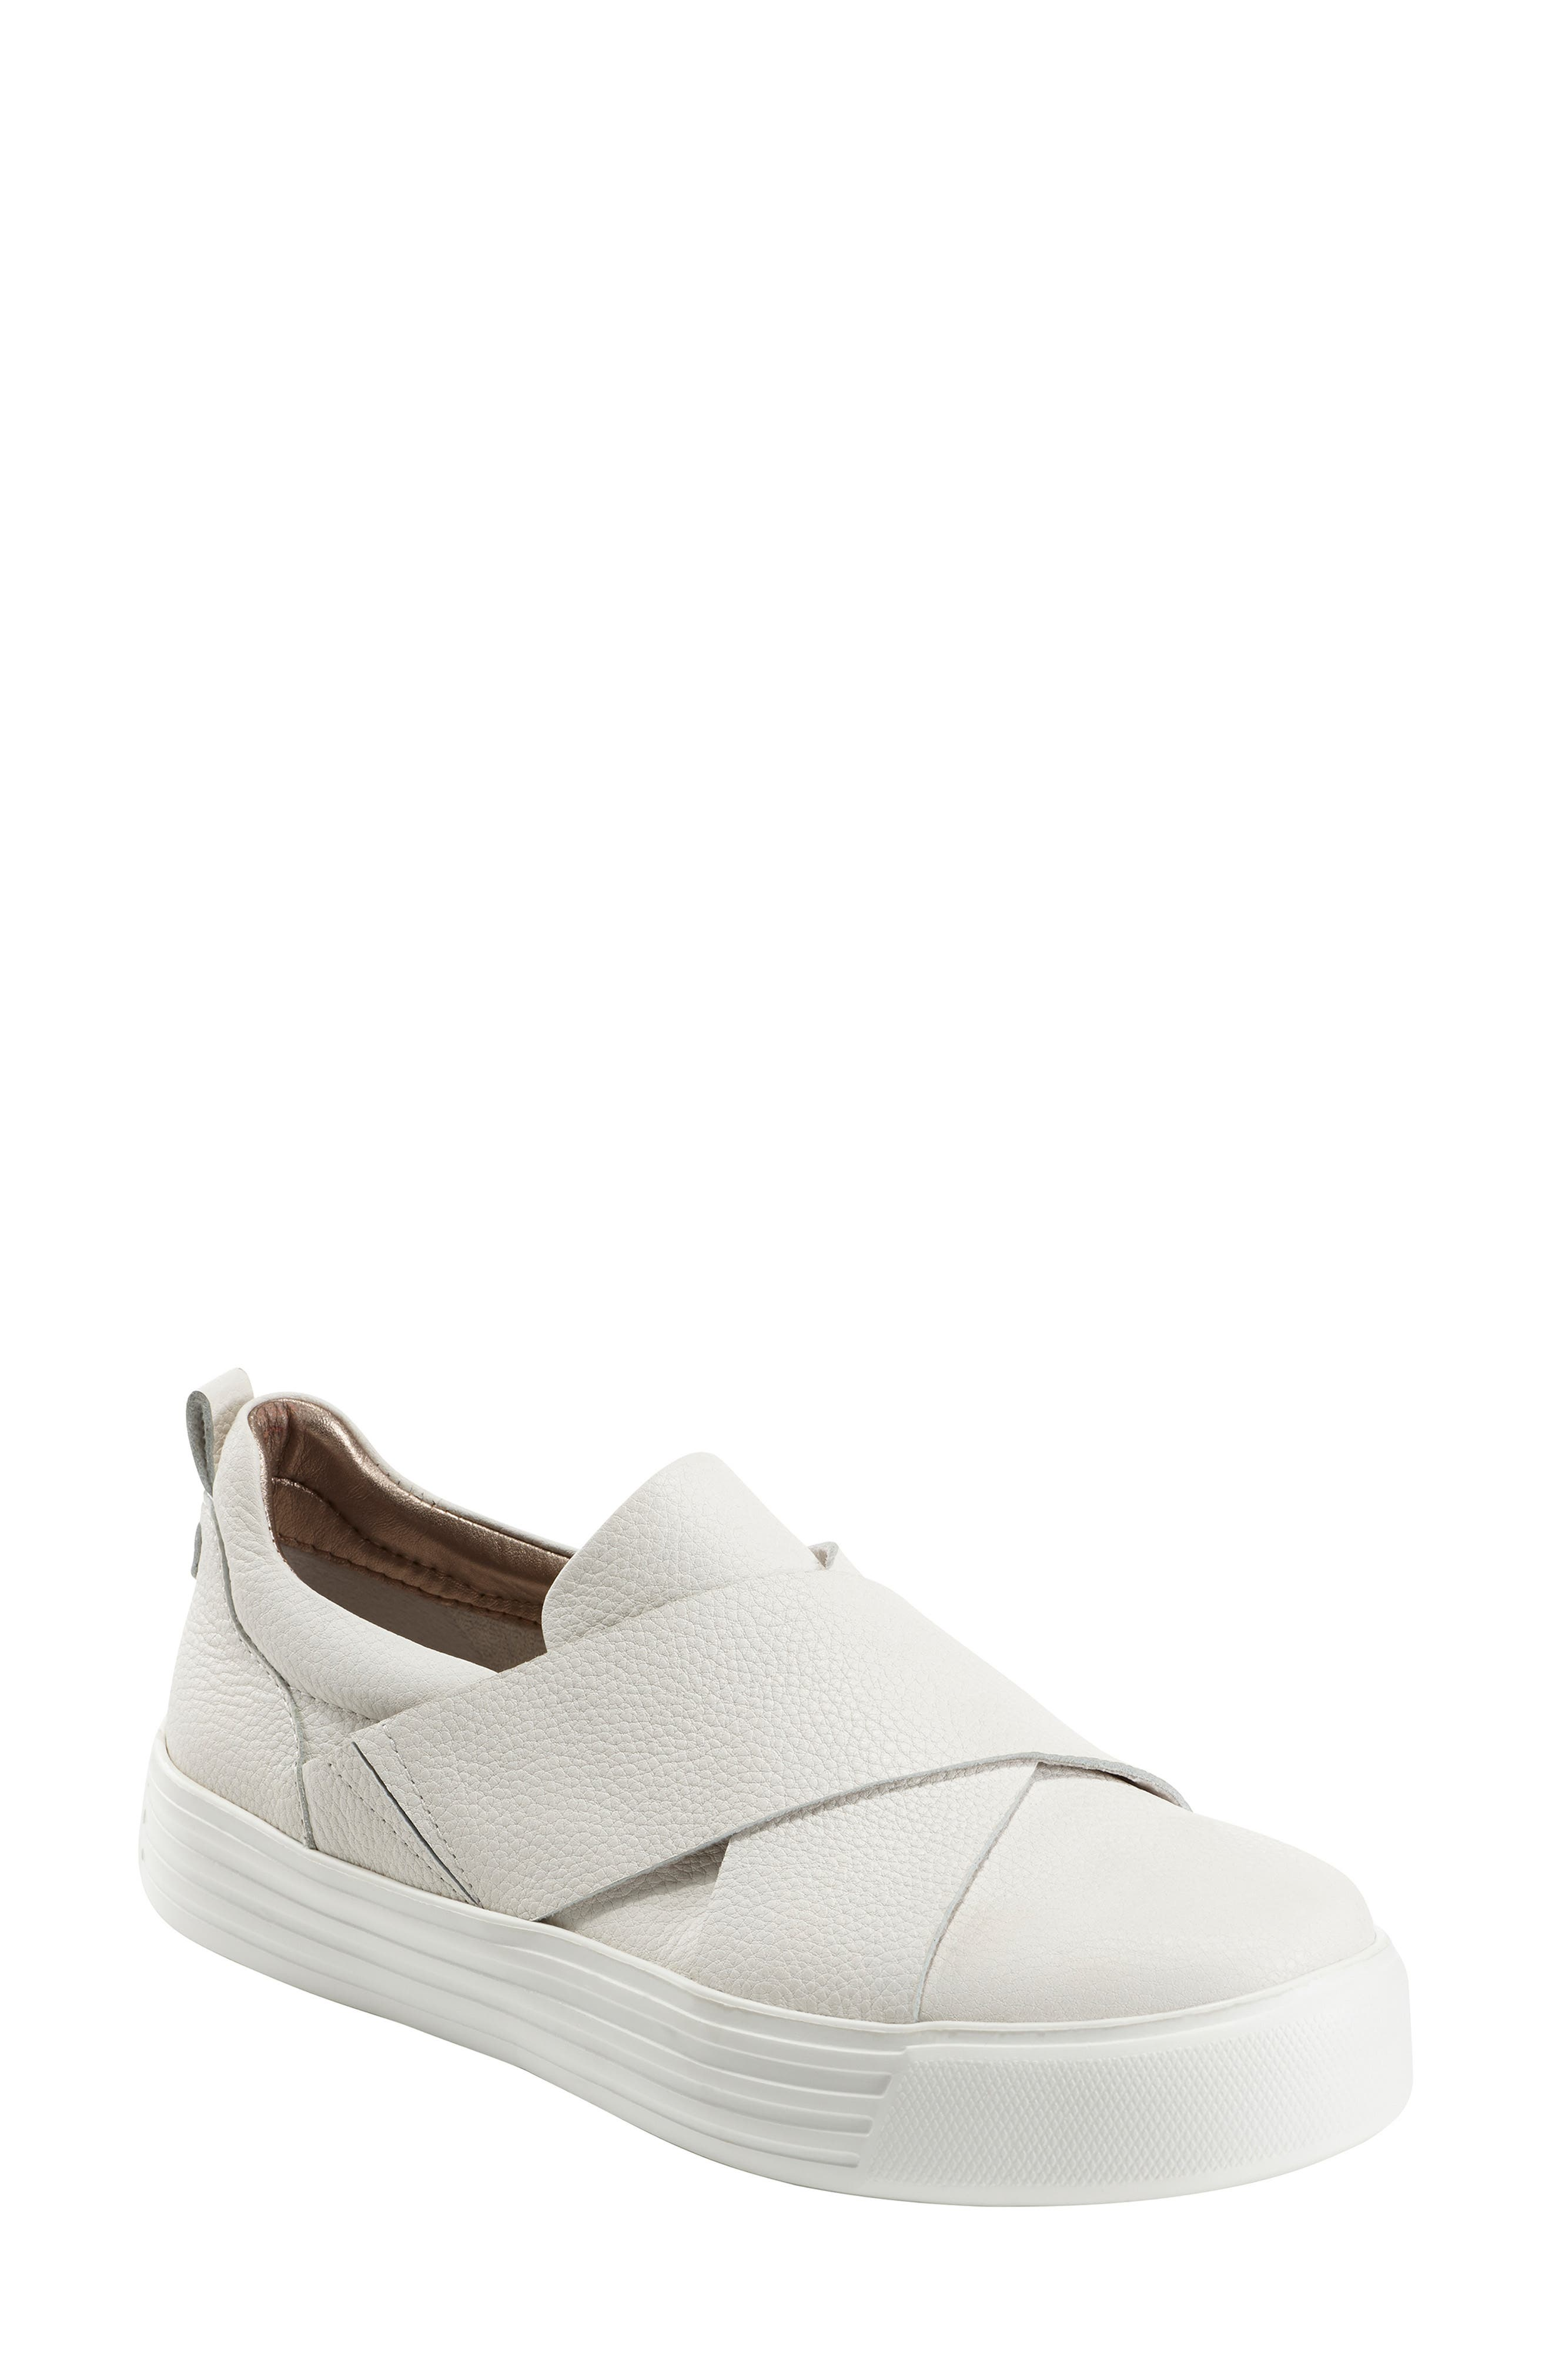 Earth Clary Sneaker- White